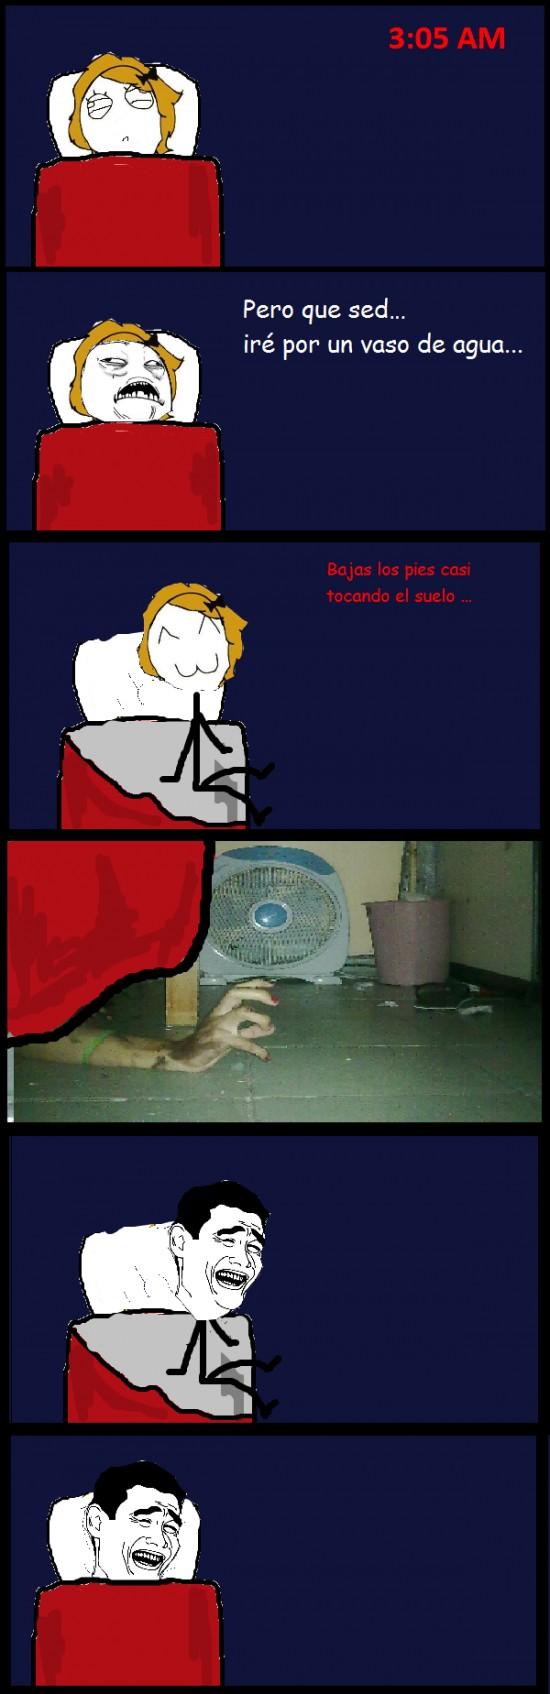 Yao - Quién necesita agua